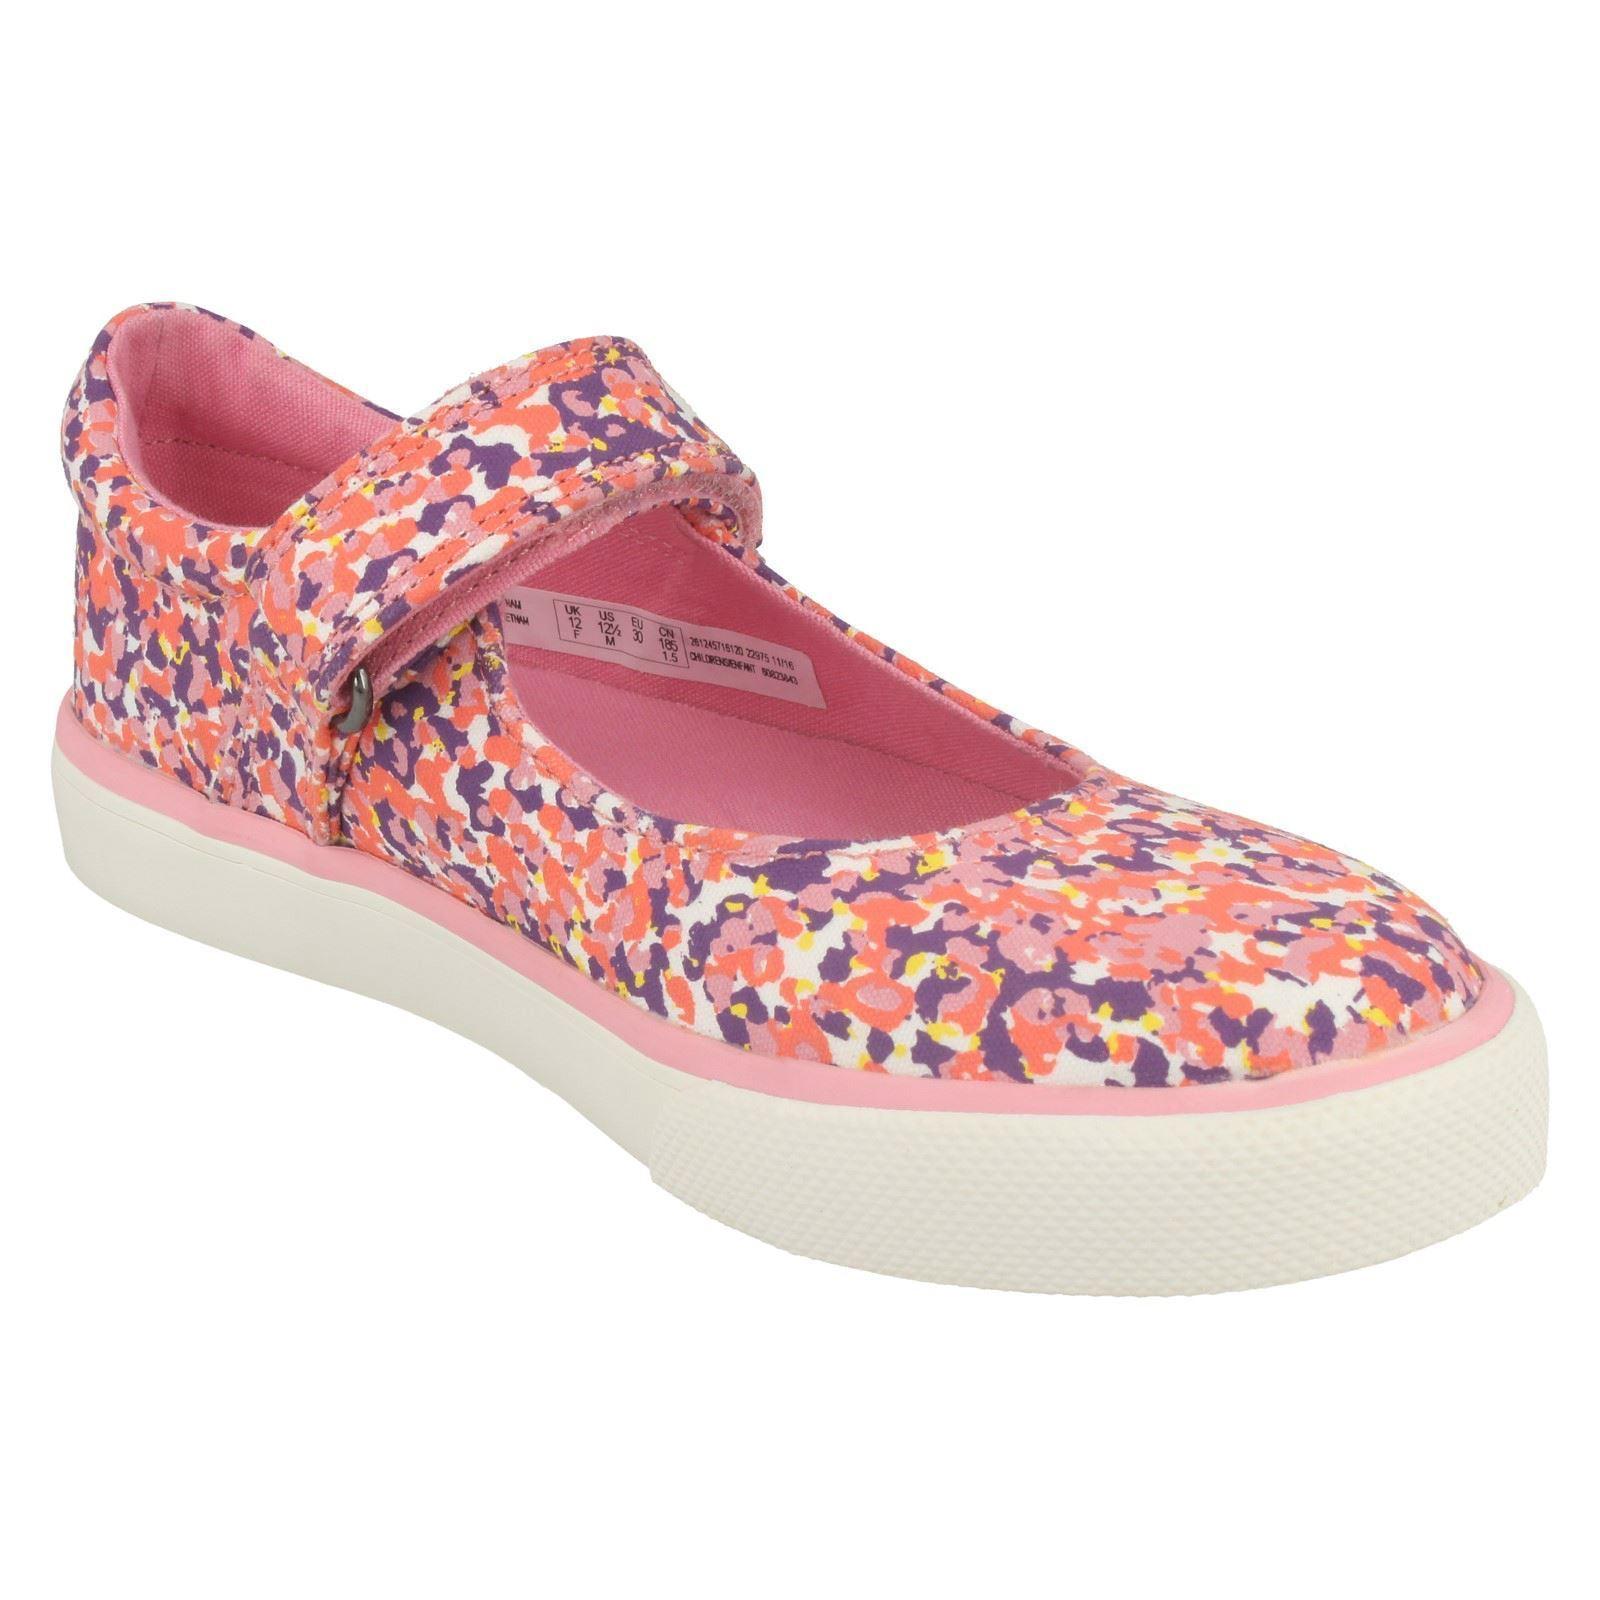 Girls Clarks Canvas Shoes Brill Gem